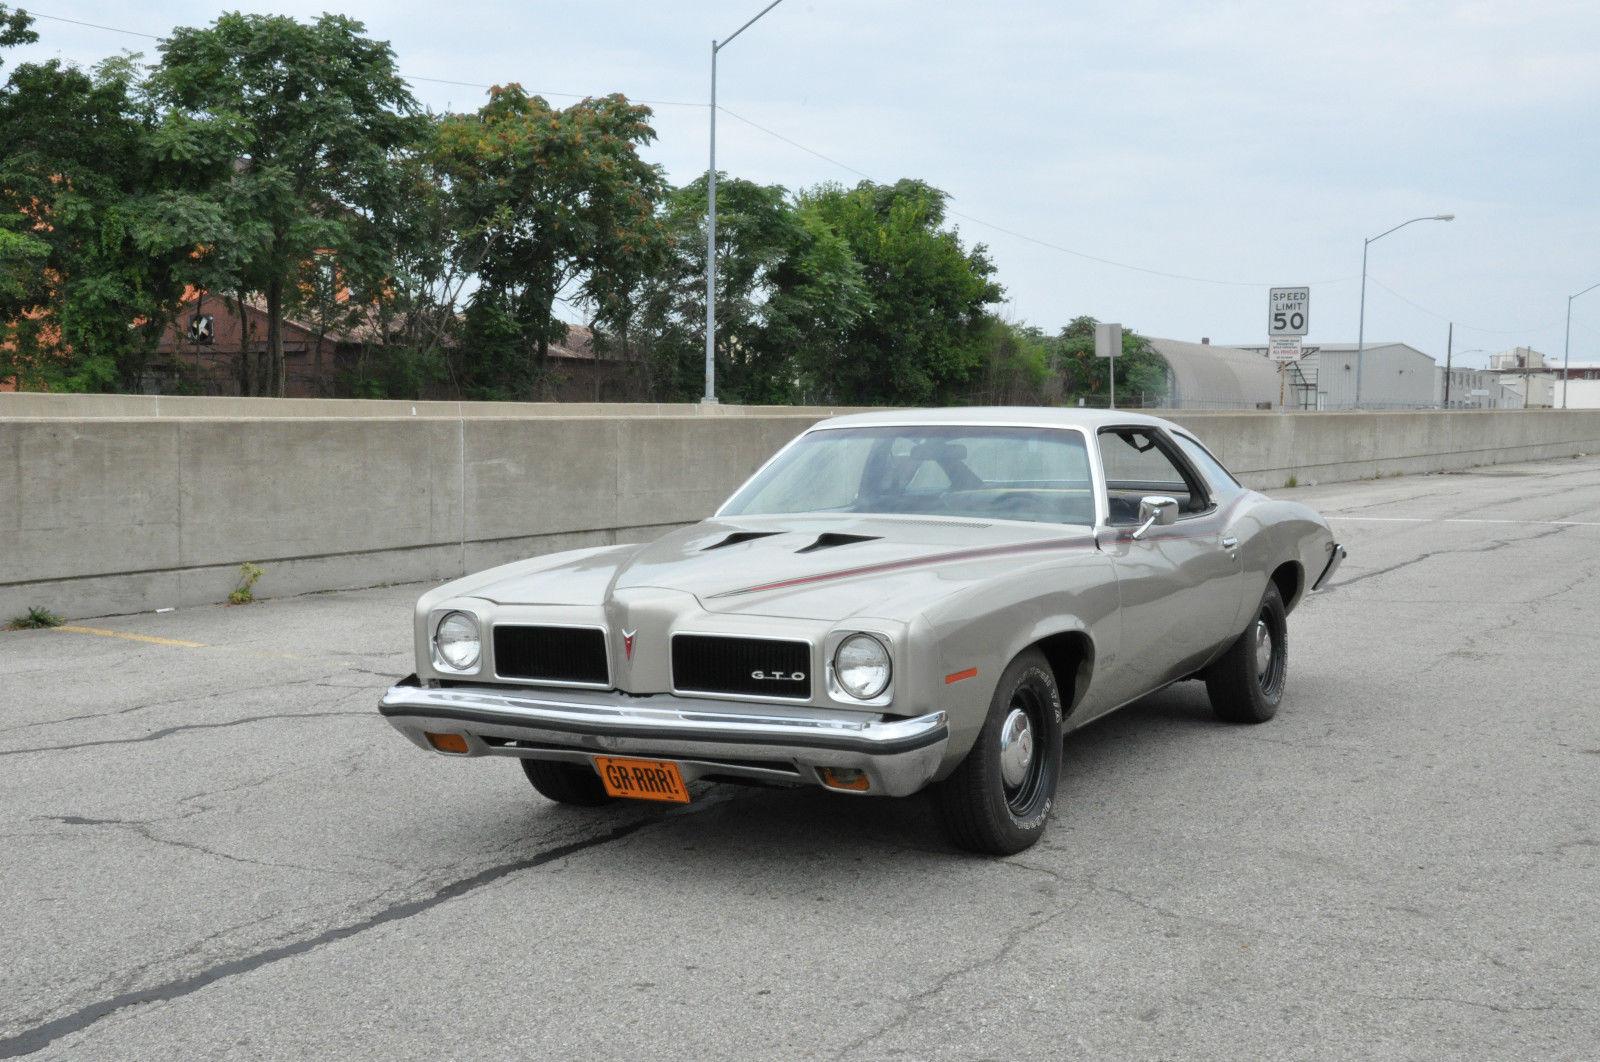 1973 Pontiac Gto 4 Speed 400 C I Coupe Base Hardtop 2